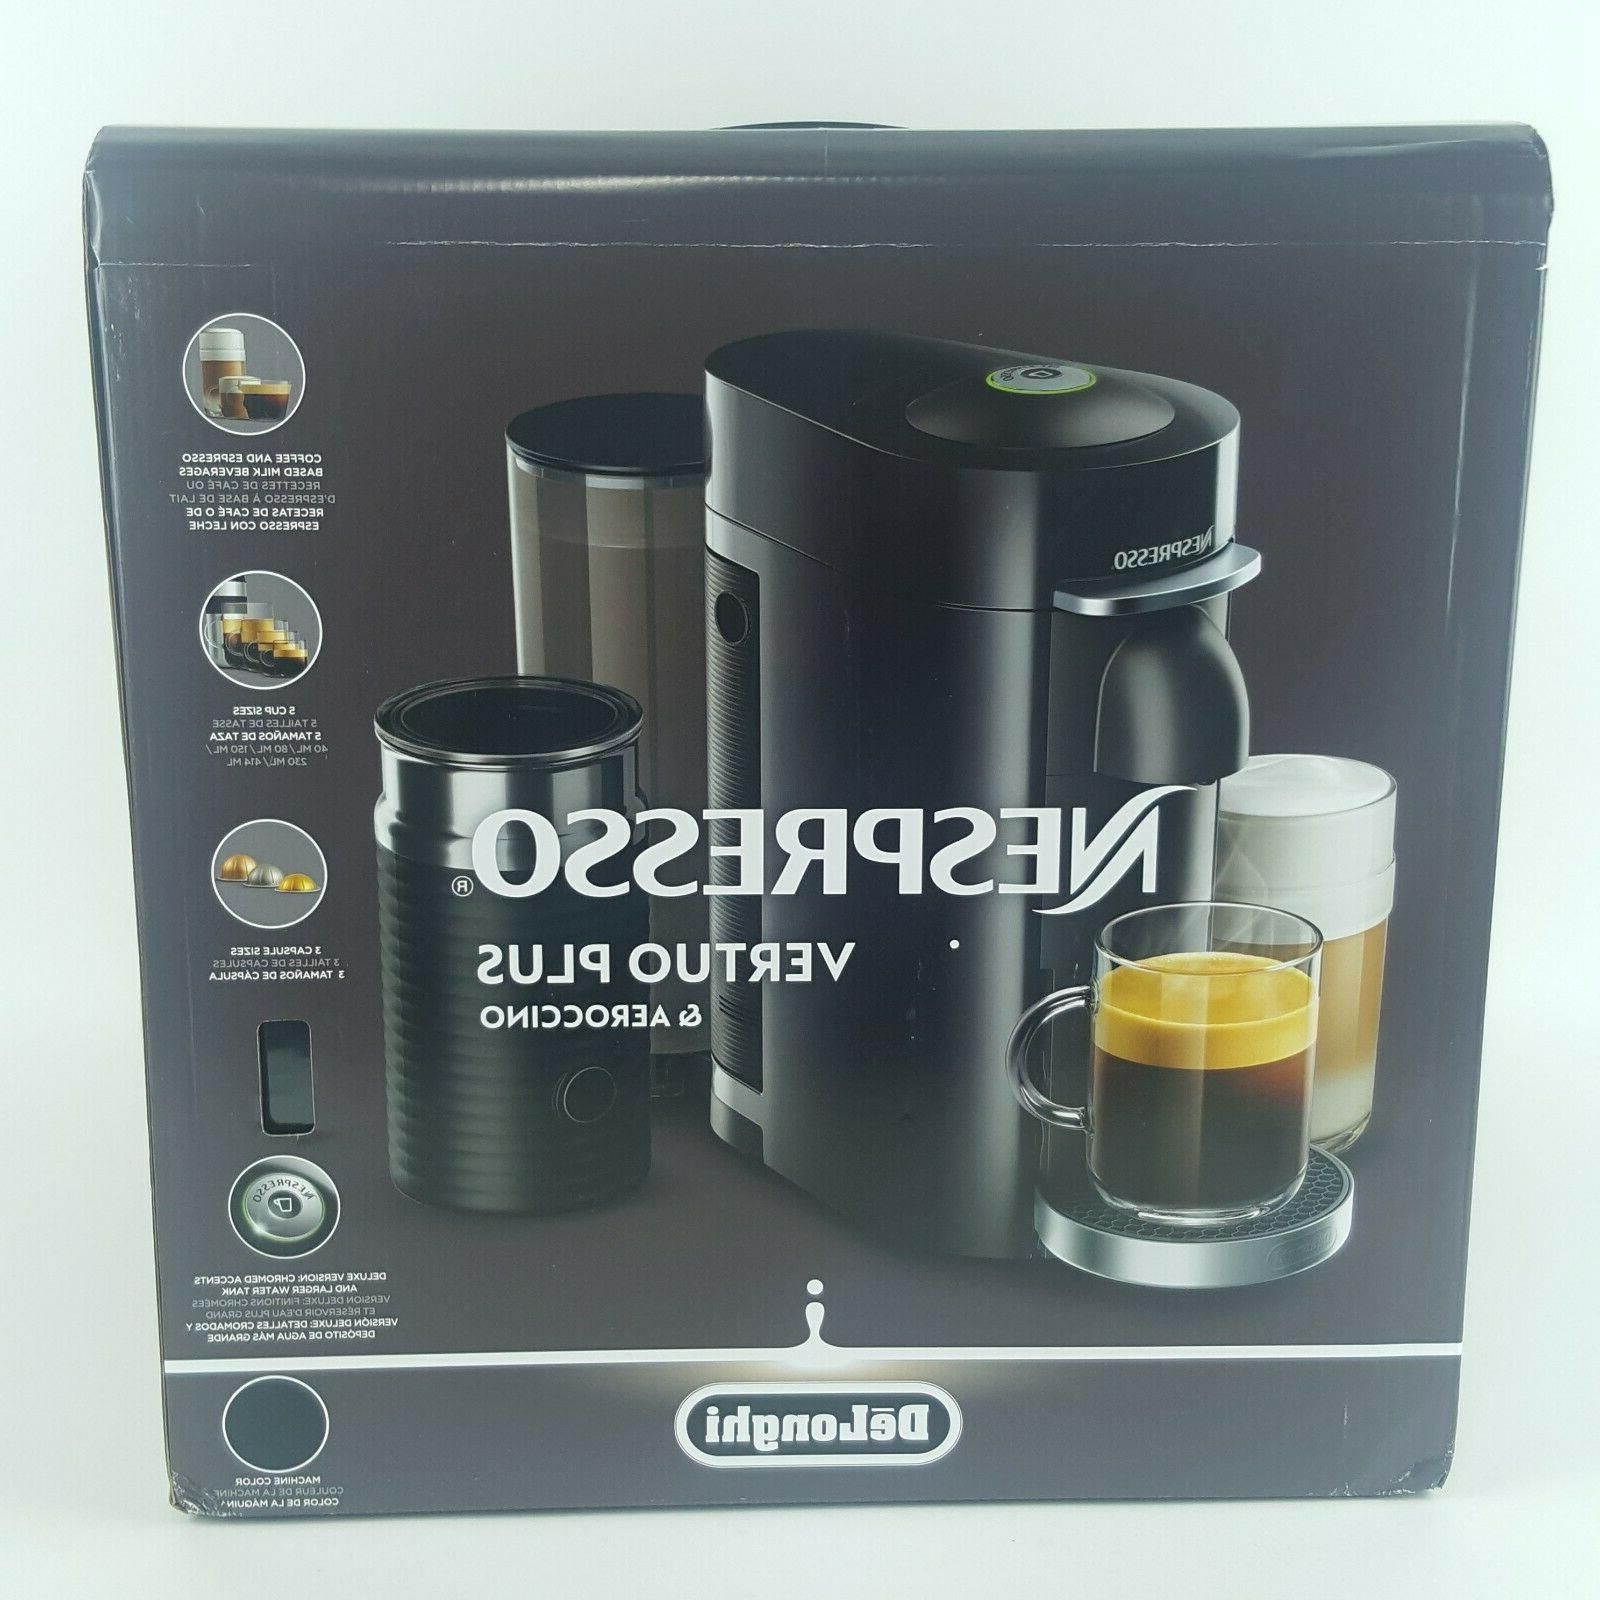 Nespresso Vertuo Deluxe Coffee with Aeroccino